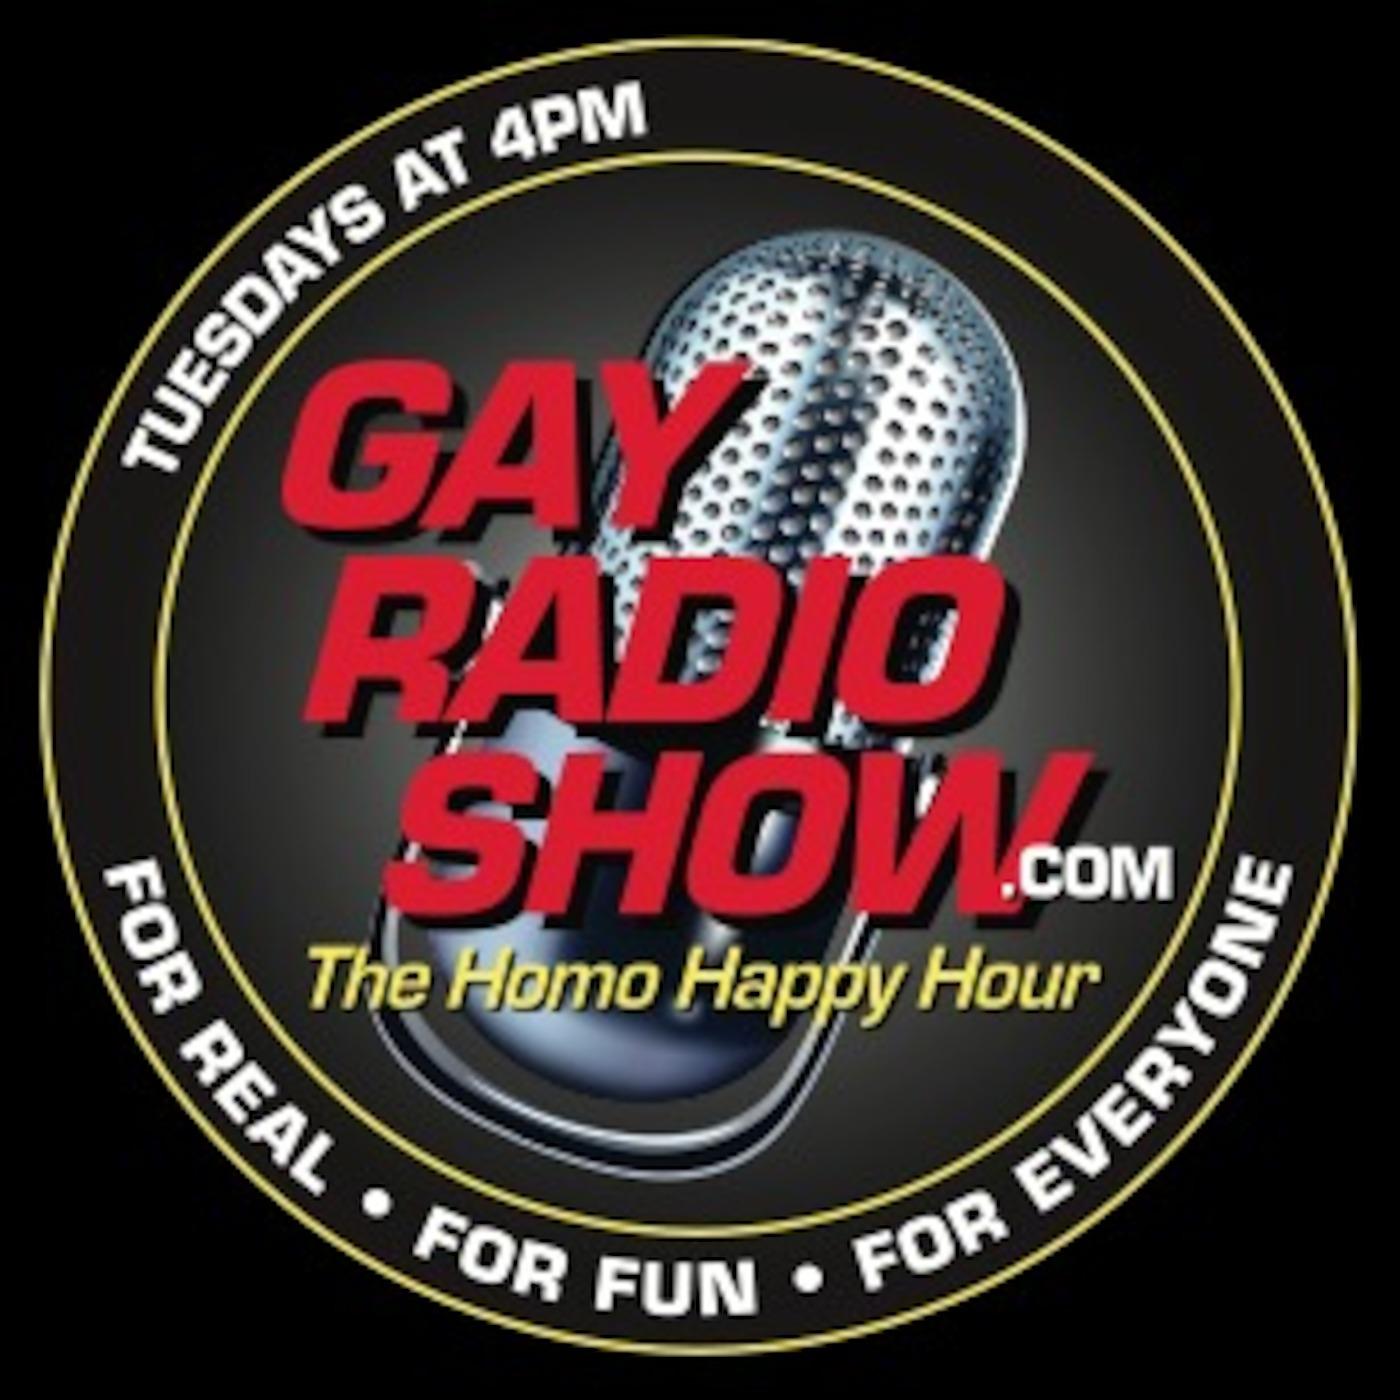 GayRadioShow.com